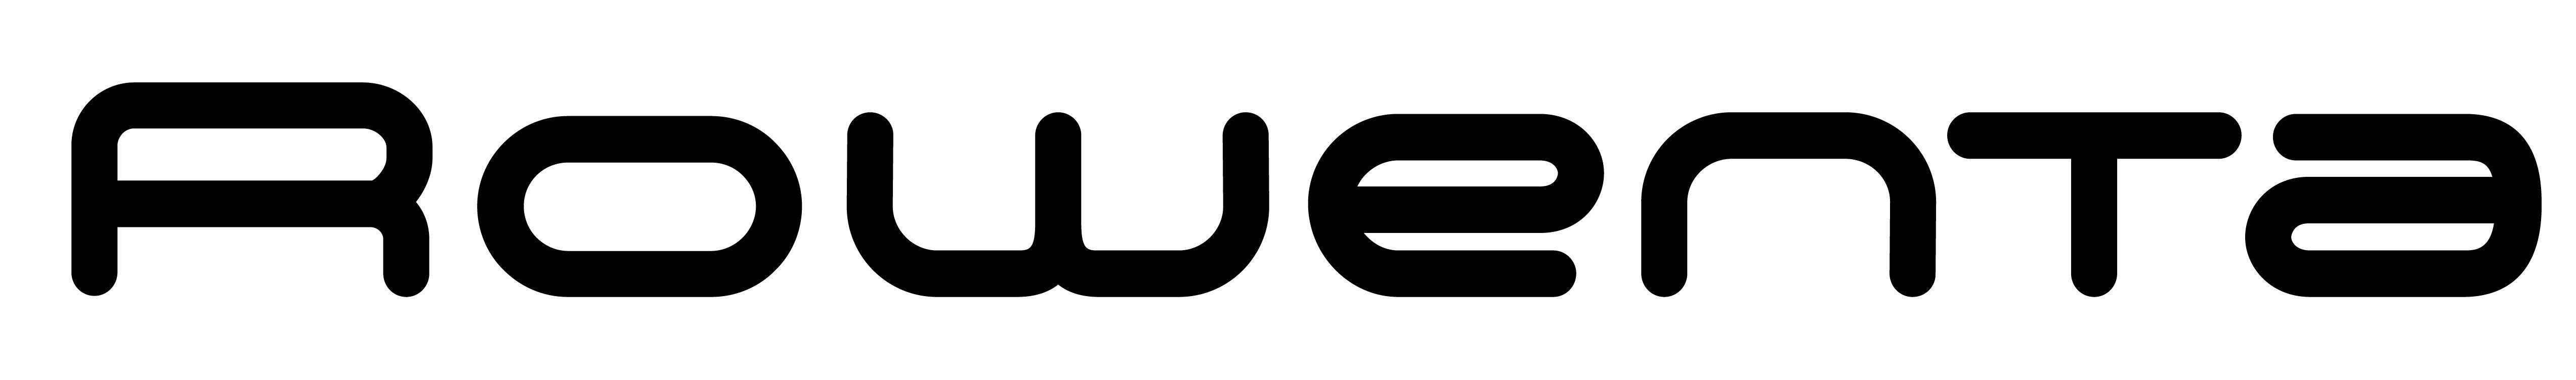 DateiEasyJet logosvg  Wikipedia